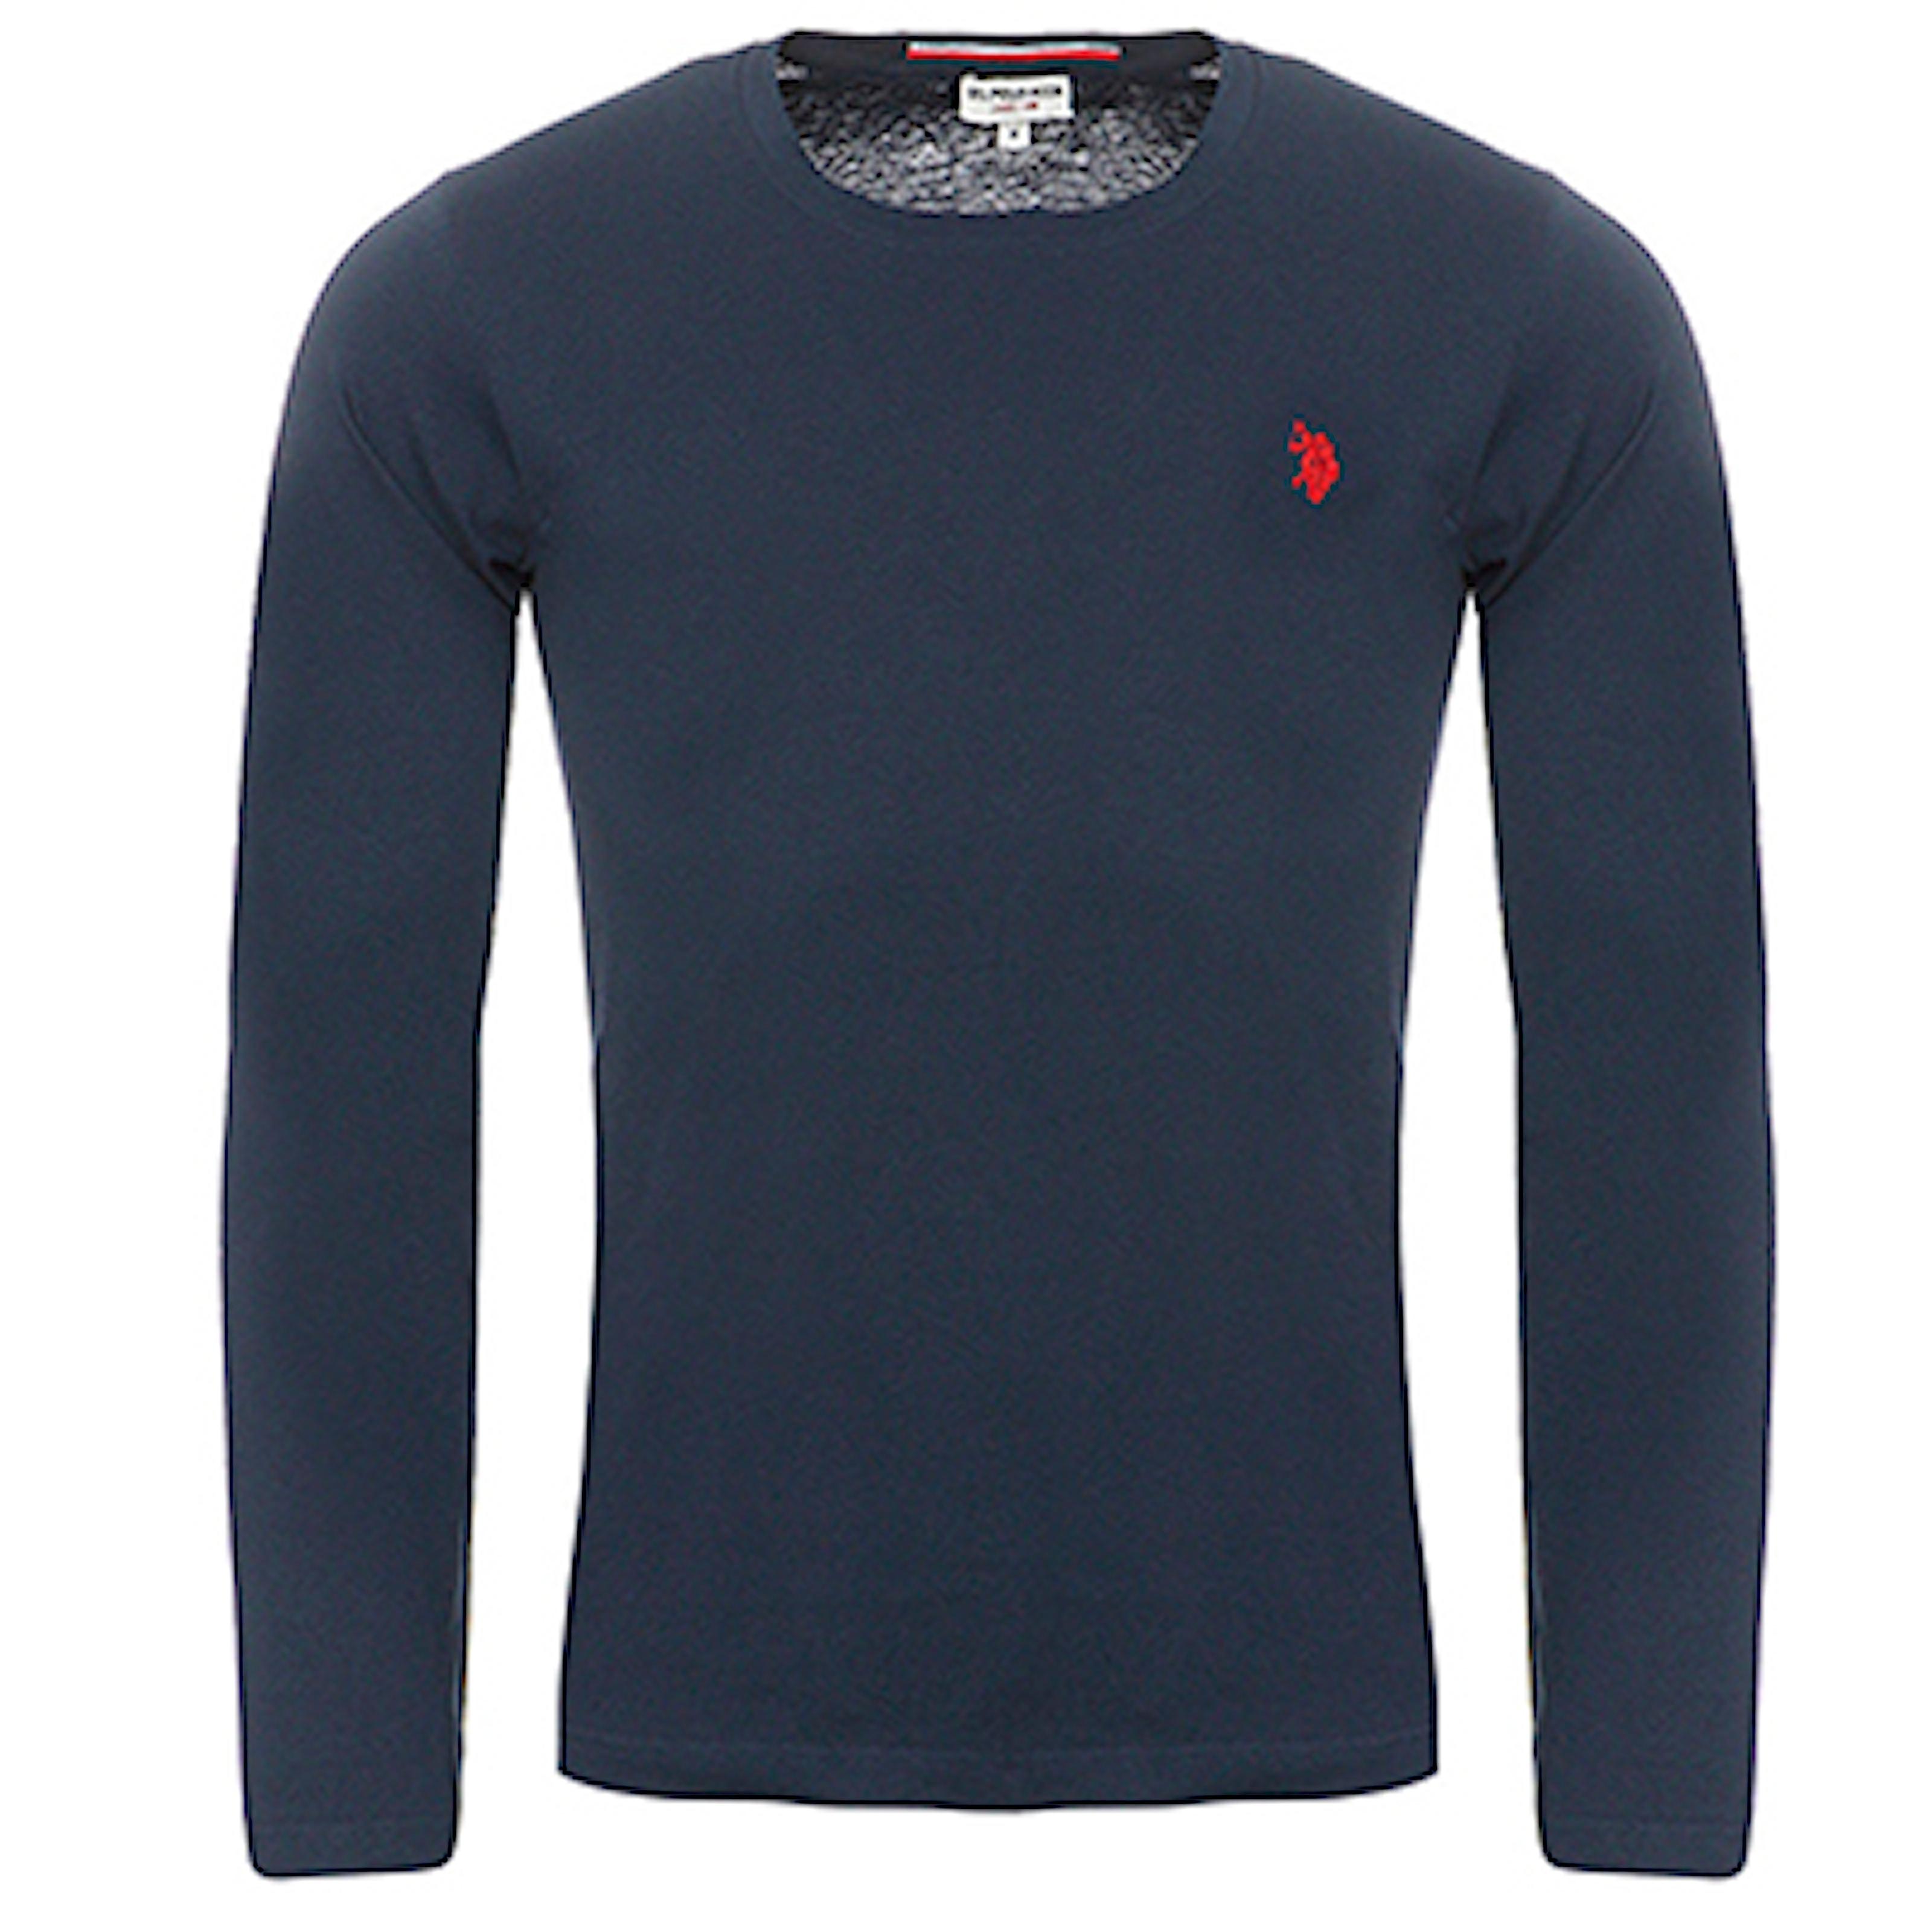 Marineblå, M, US Polo Longsleeve, U.S. Polo genser, ,